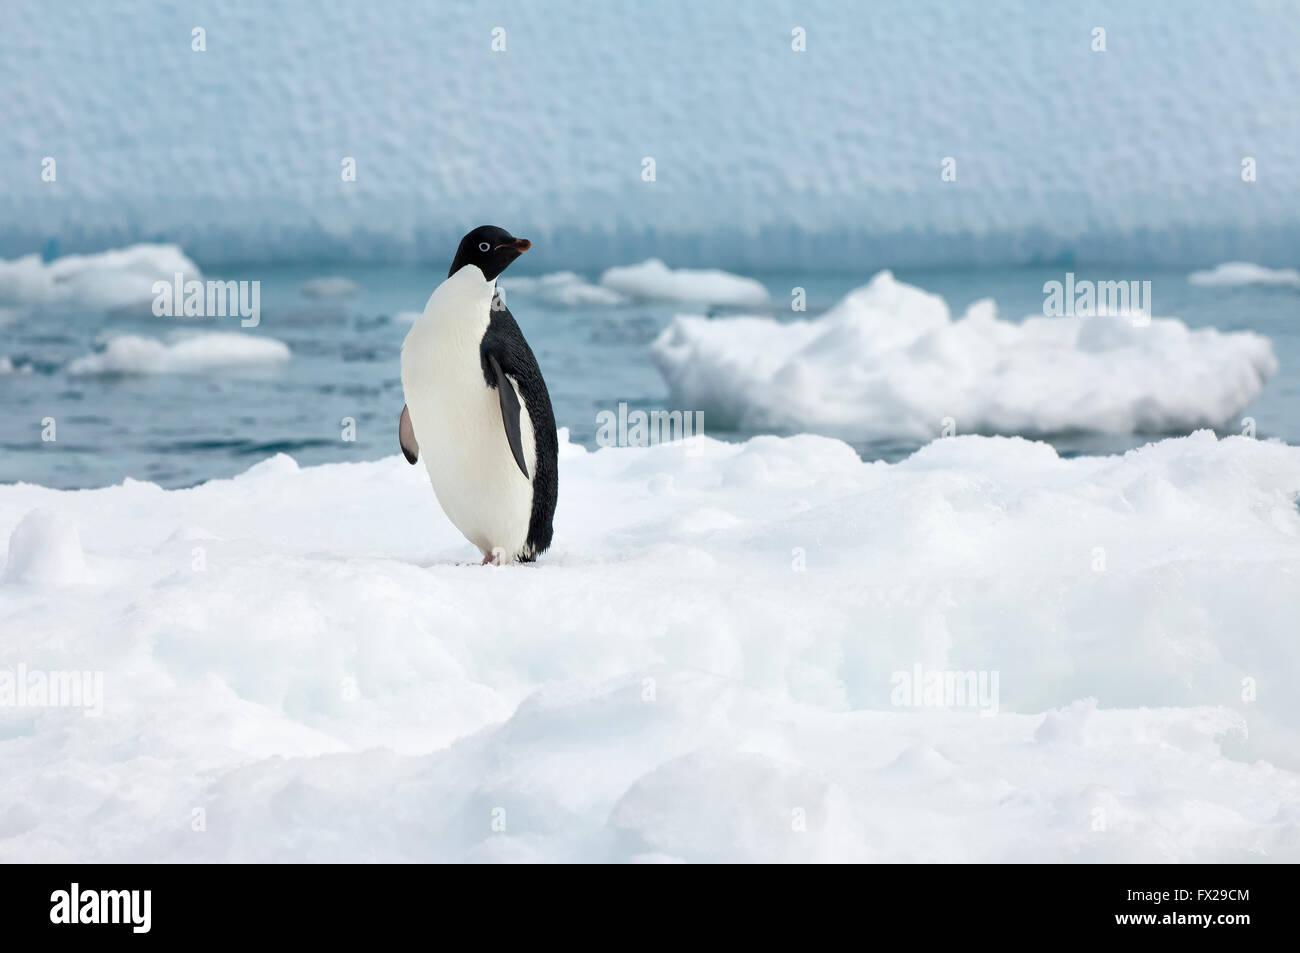 Adelie penguin (Pygoscelis adeliae) standing on an iceberg, Paulet Island, Erebus and Terror Gulf, Antarctic peninsula - Stock Image